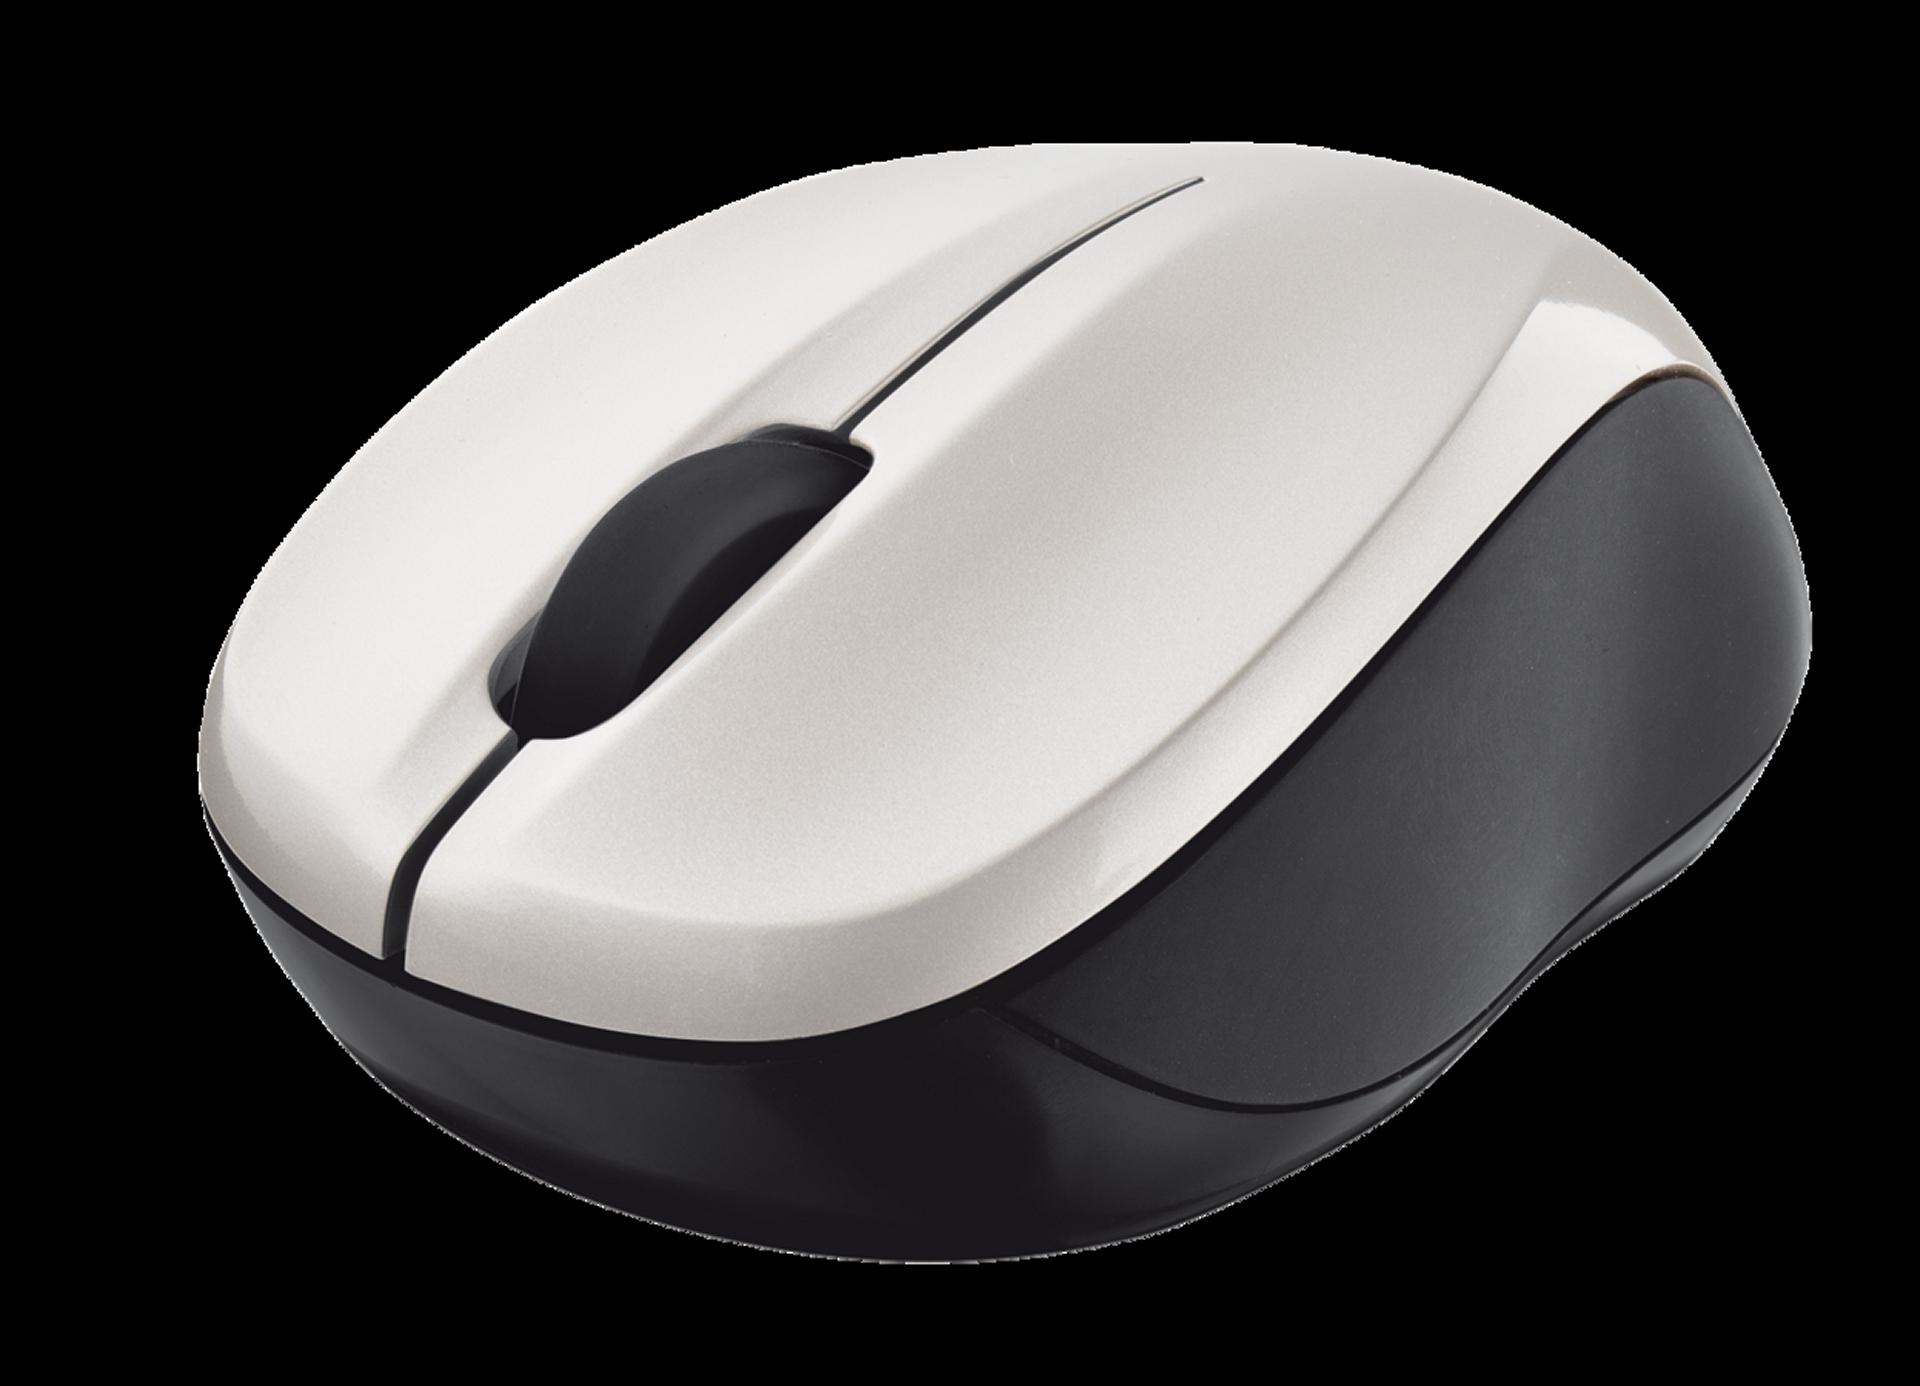 myš TRUST Vivy Wireless Mini Mouse - White